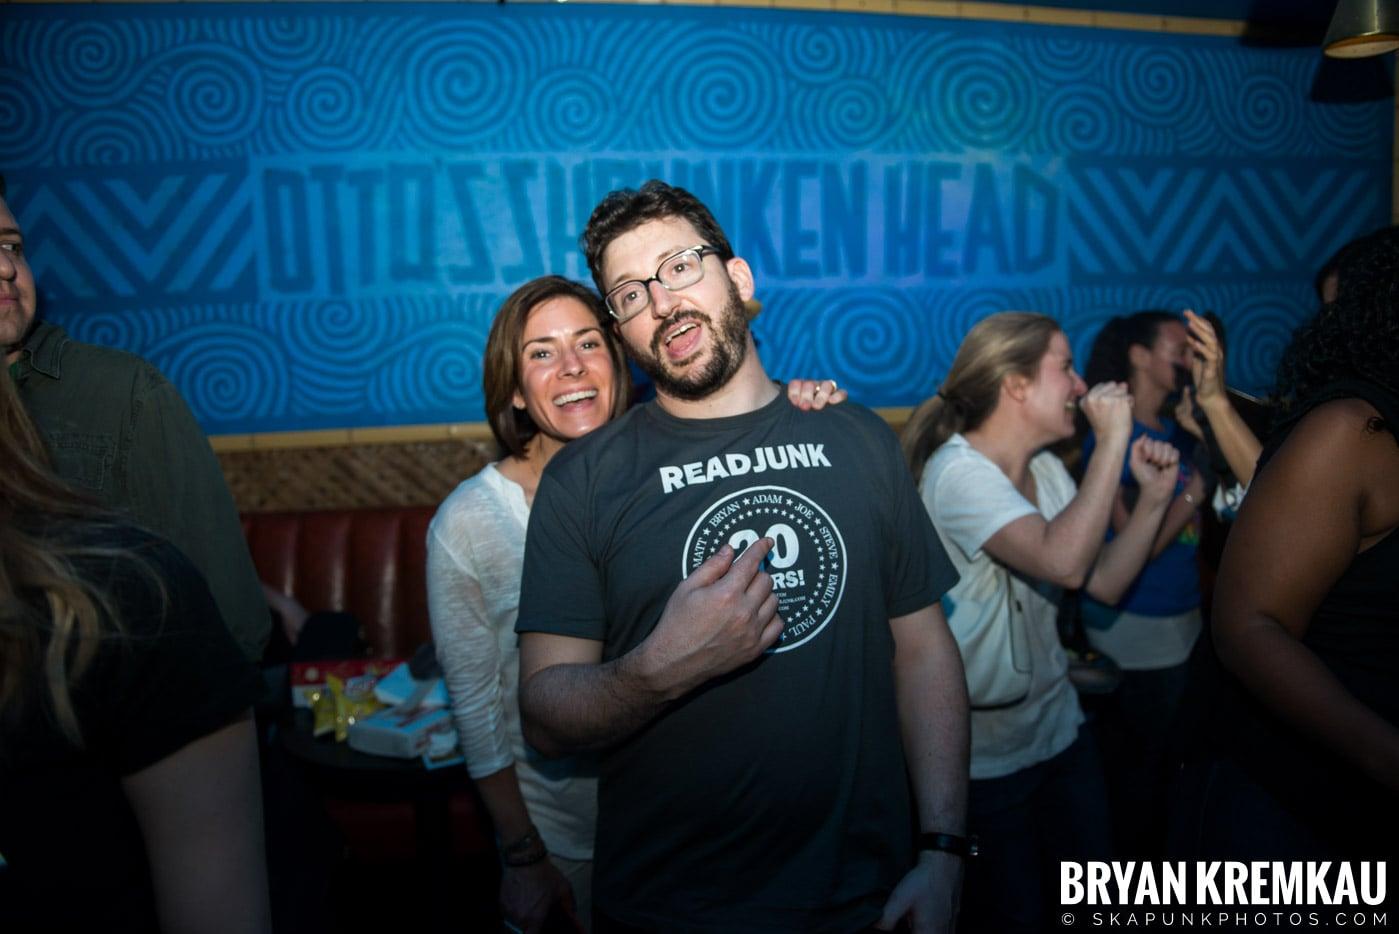 ReadJunk.com 20th Anniversary Party @ Otto's Shrunken Head, NYC - 4.29.17 (8)